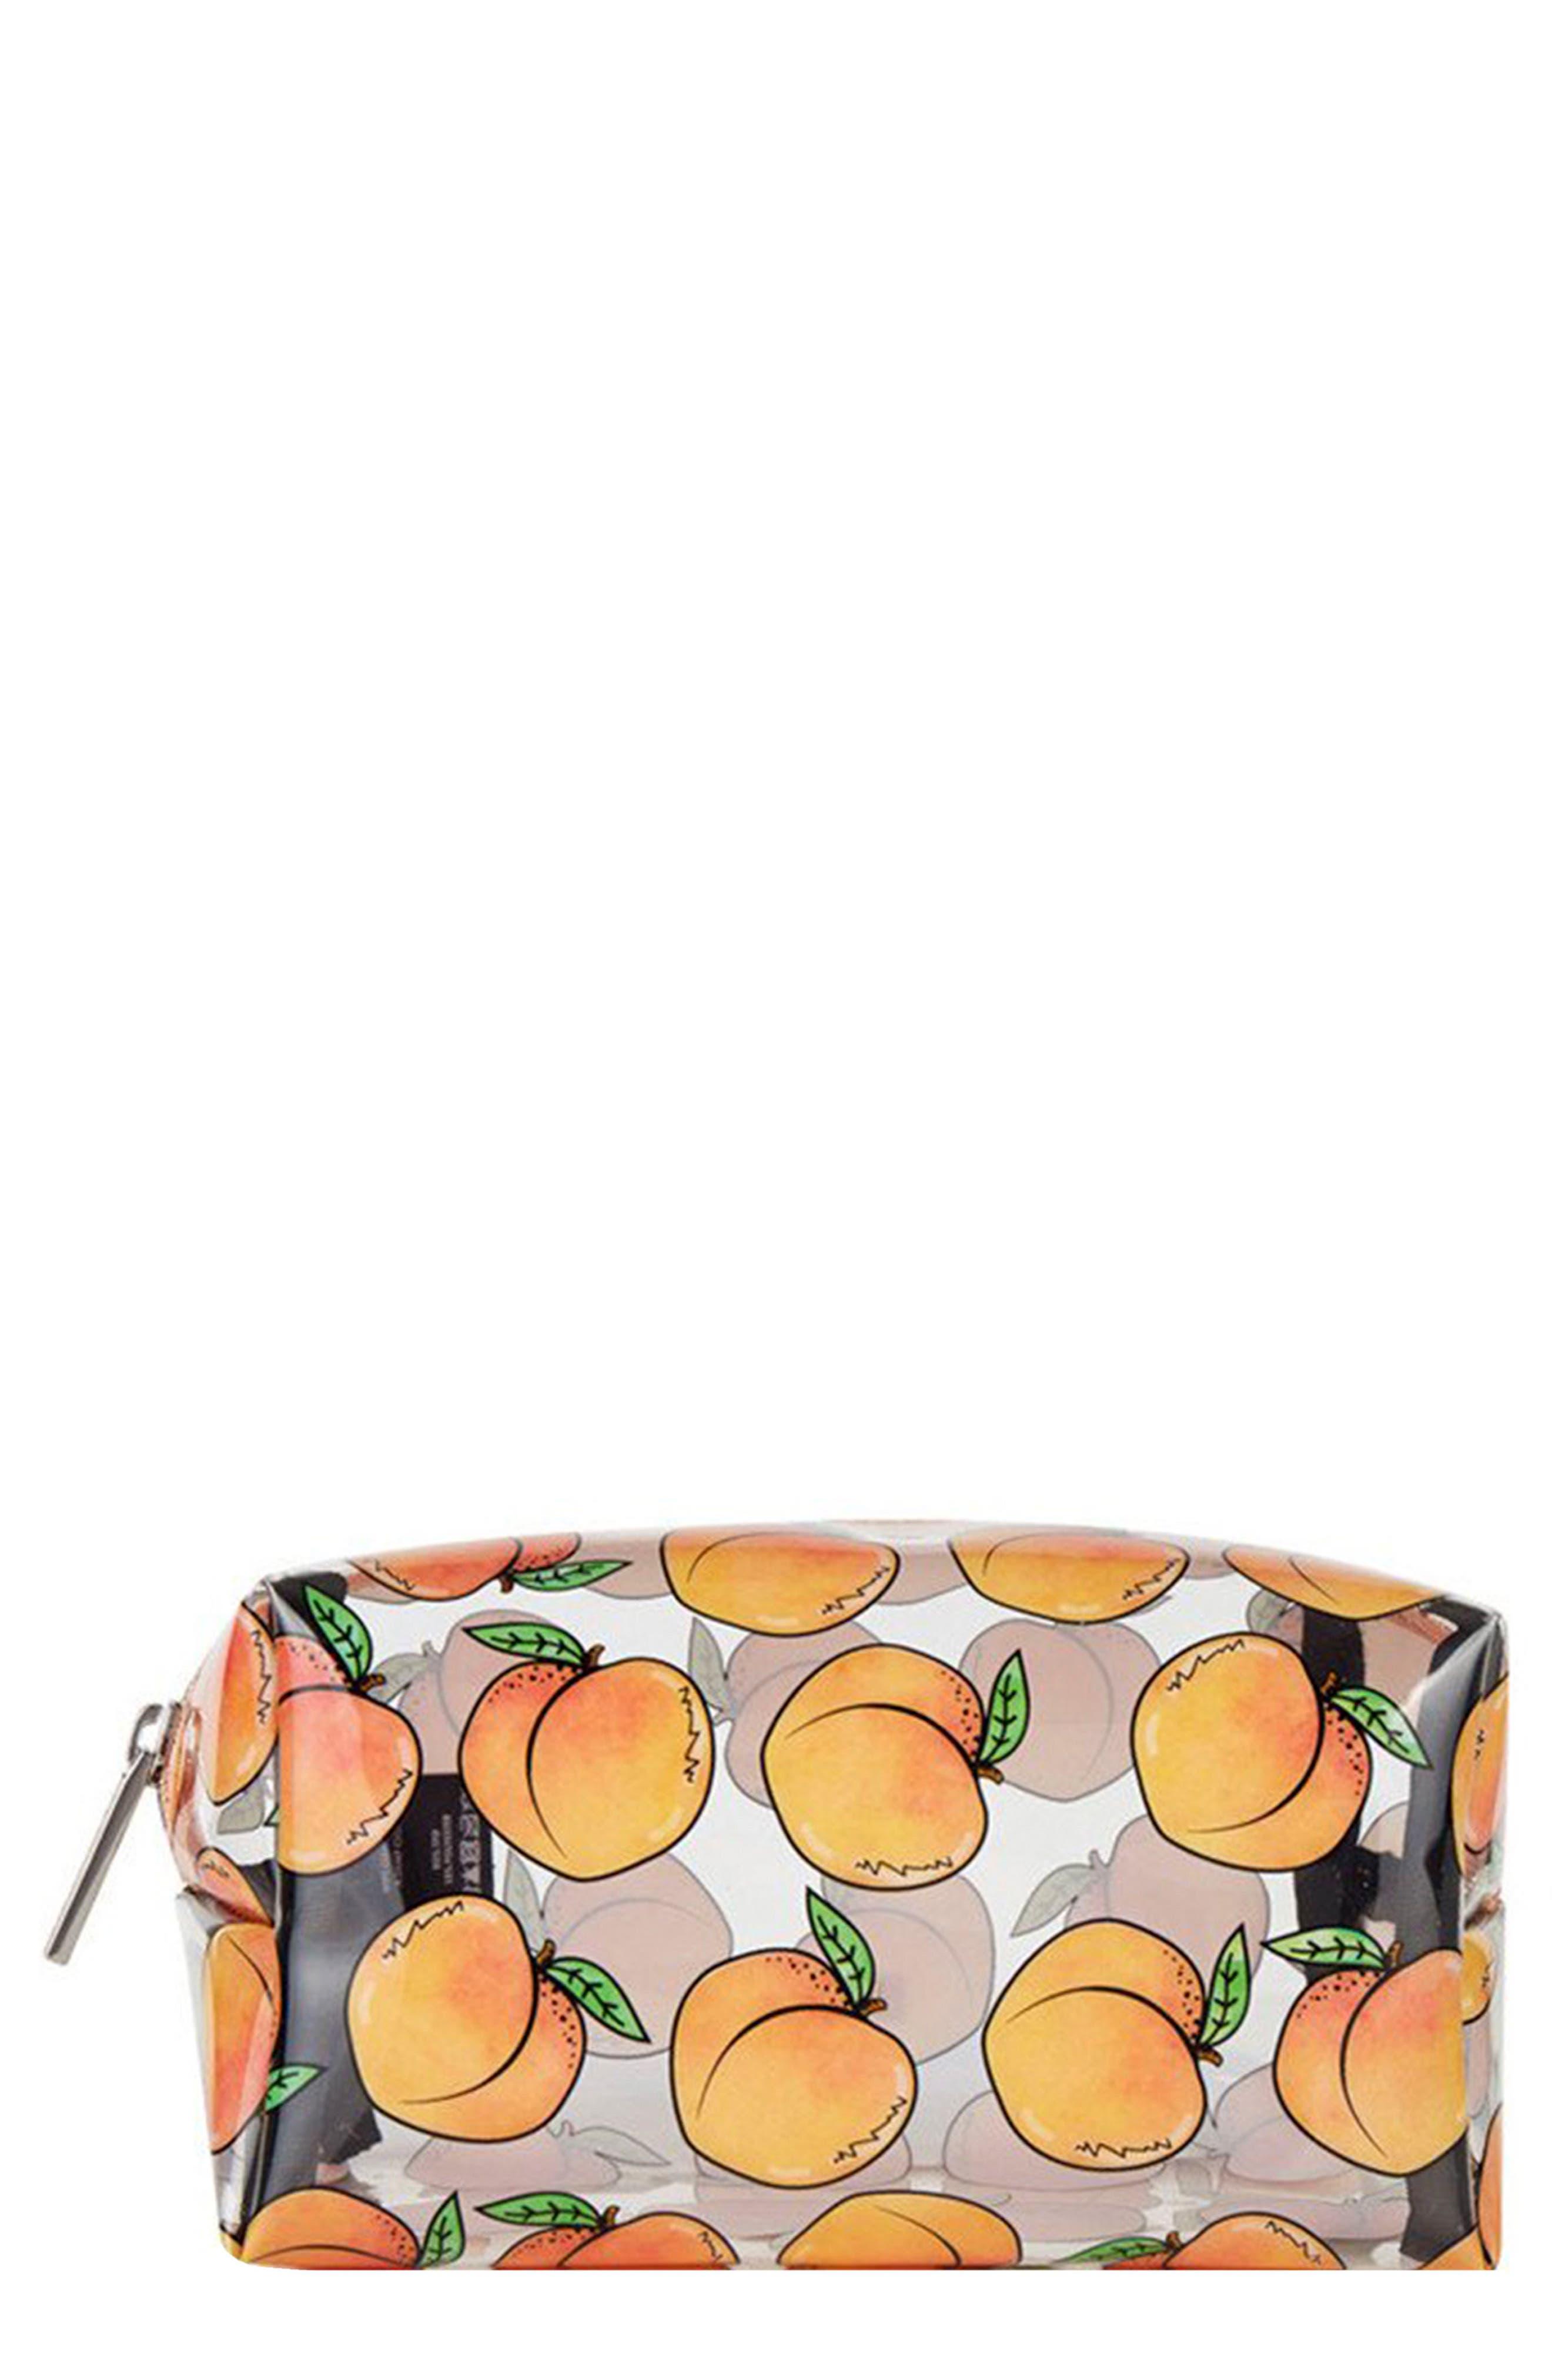 SKINNYDIP Peachy Clear Makeup Bag, Main, color, NO COLOR